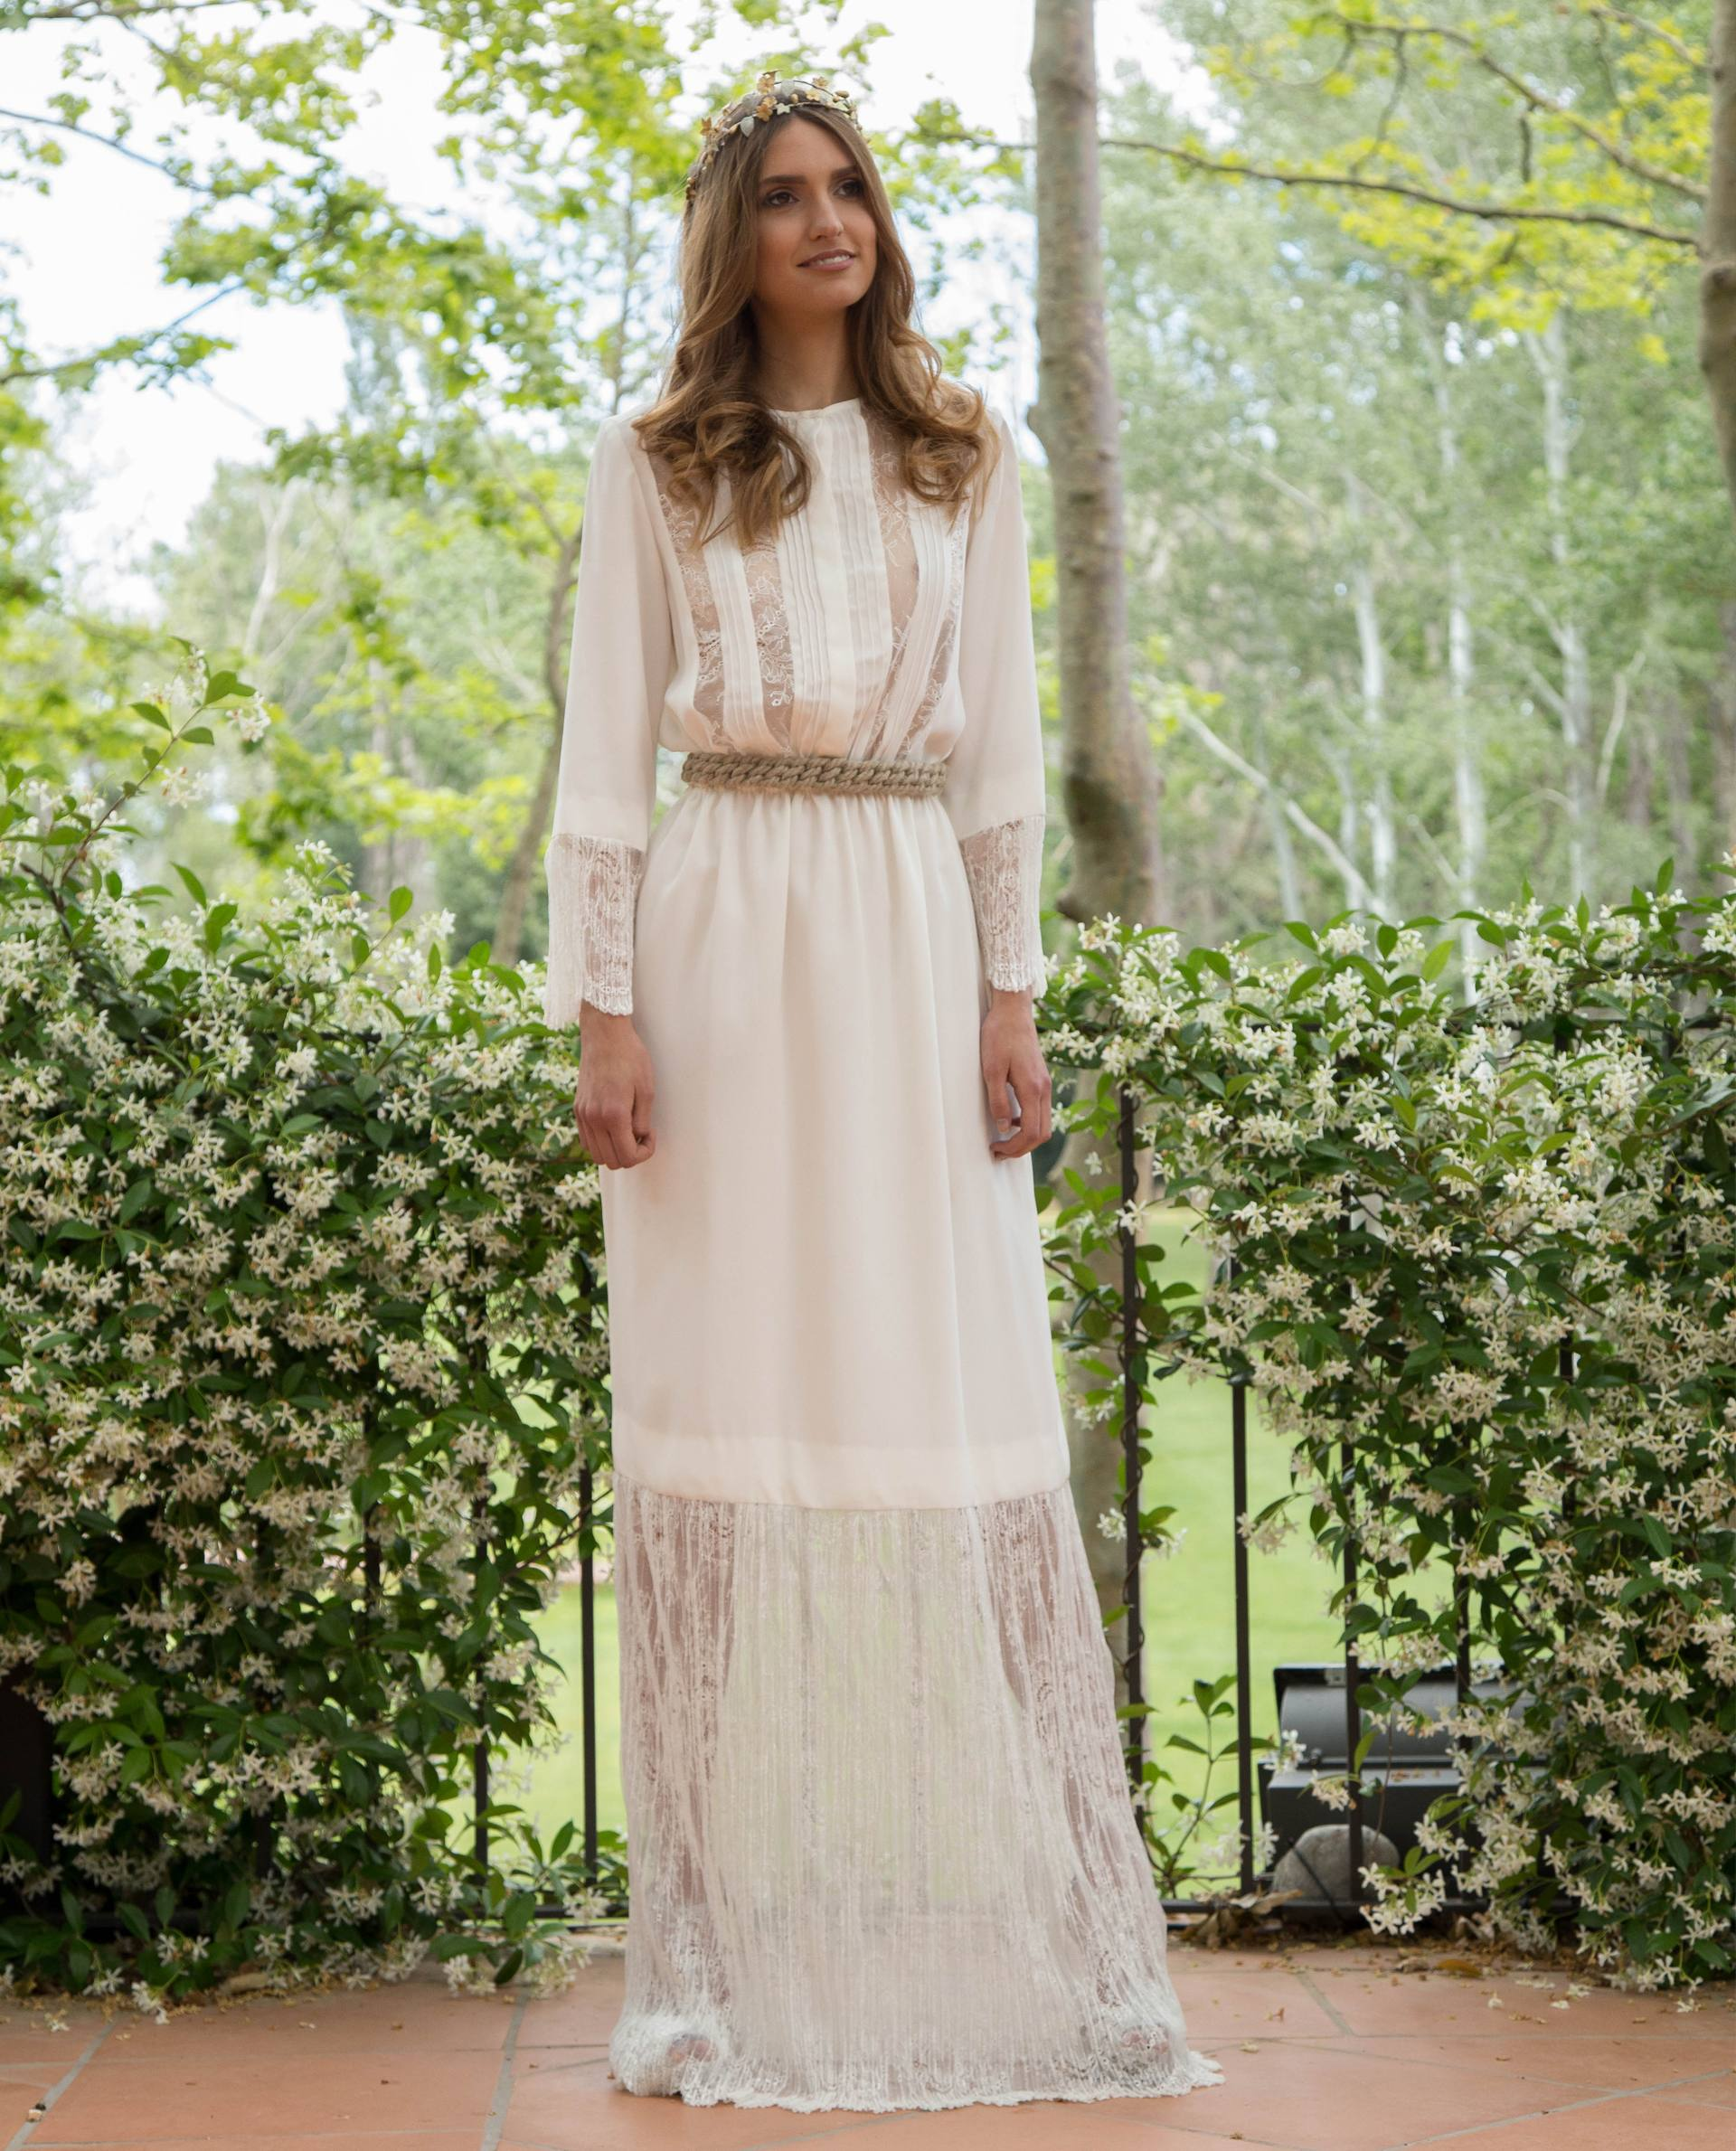 BRIDAL-NATURE 2018/19 - VESTIDOS - vestido novia Andrea